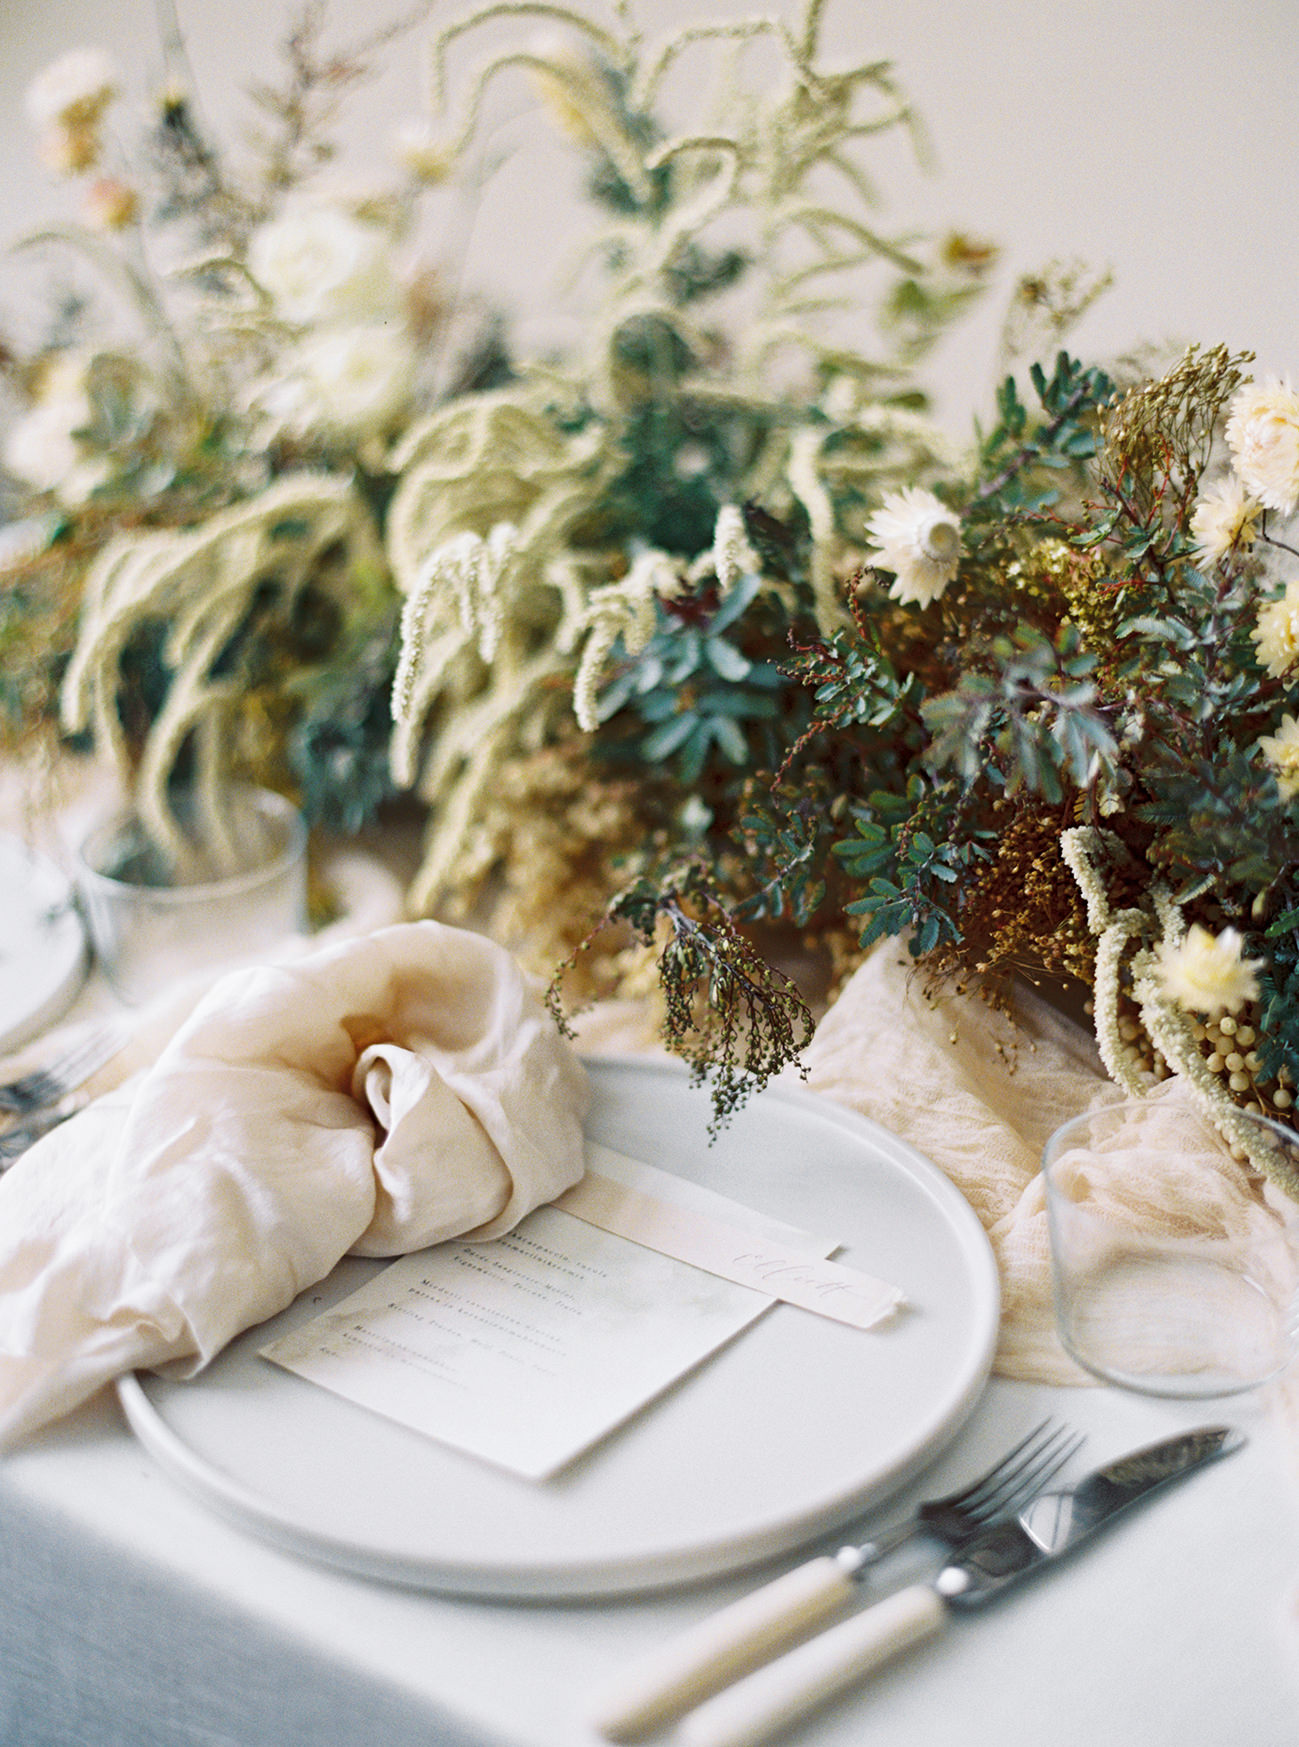 Bridal Inspiration, Wedding Bouquet, Hääkuvaus, Film Wedding Photographer, Table Setting Inspiration, Stationery, Dried Flowers, www.nordandmae.com, www.susannanordvall (21).jpg